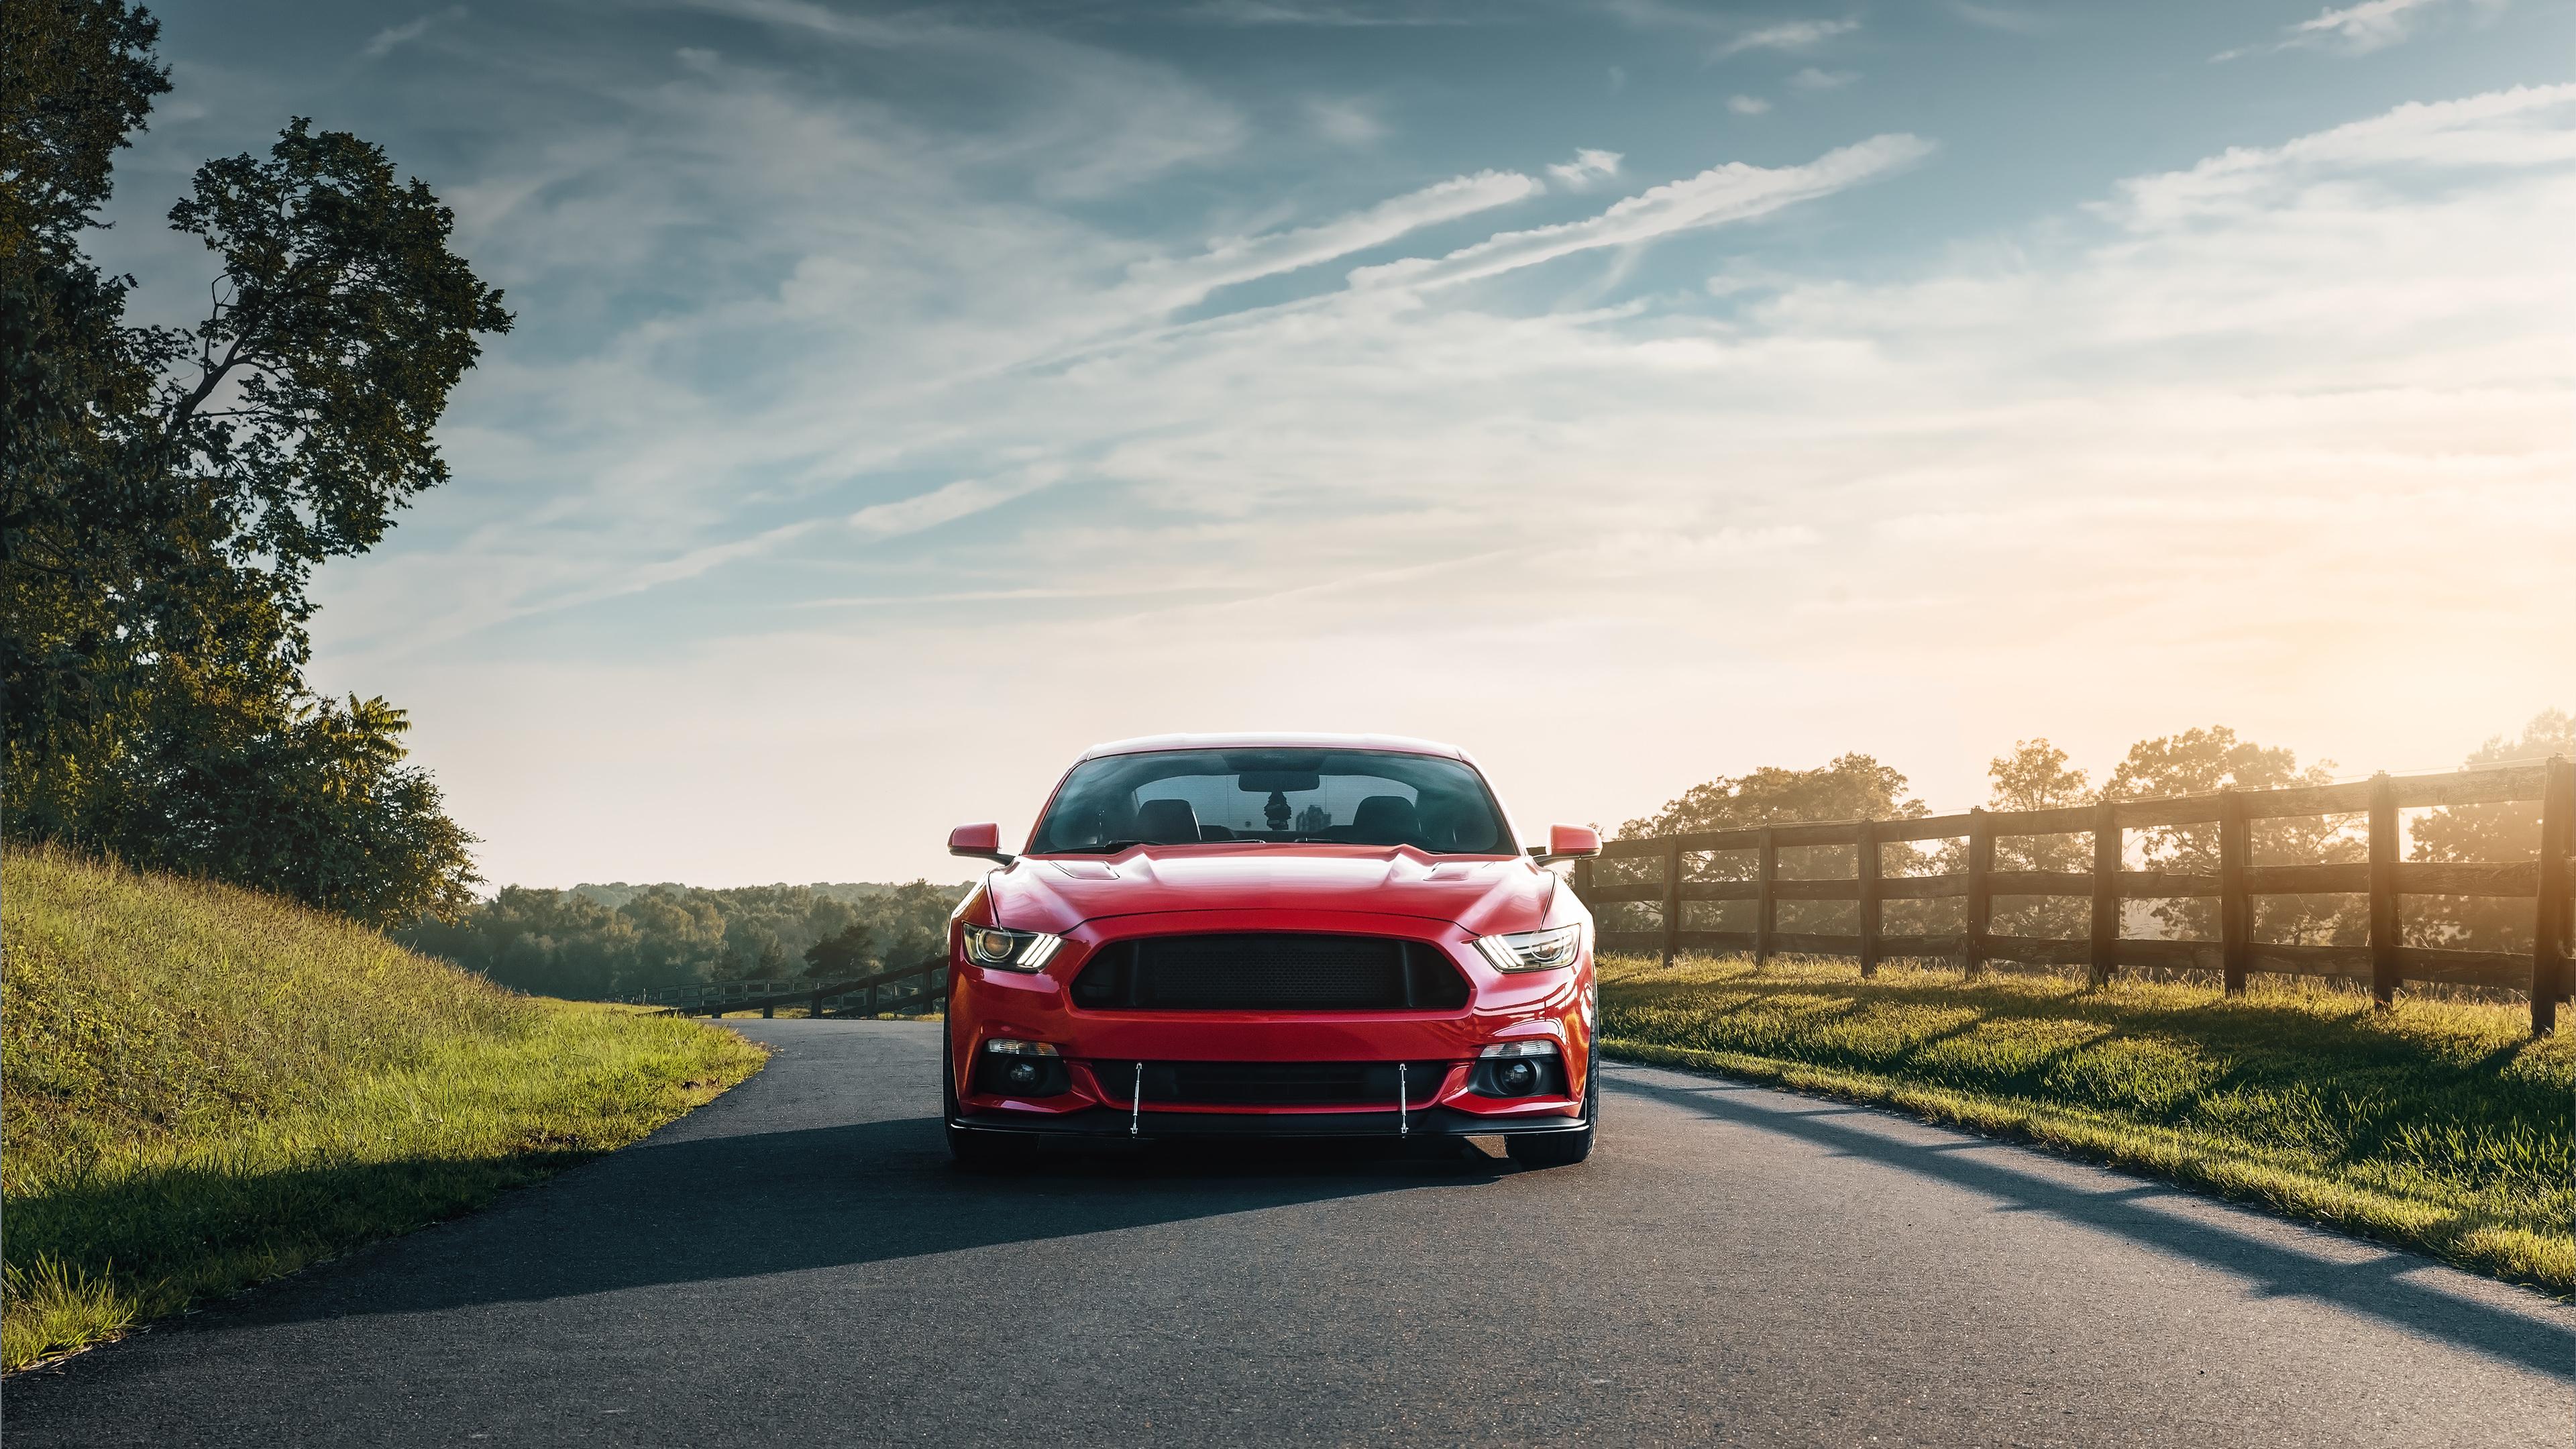 ford mustang gt front 4k 1555206872 - Ford Mustang GT Front 4k - hd-wallpapers, ford wallpapers, ford mustang wallpapers, cars wallpapers, behance wallpapers, 4k-wallpapers, 2019 cars wallpapers